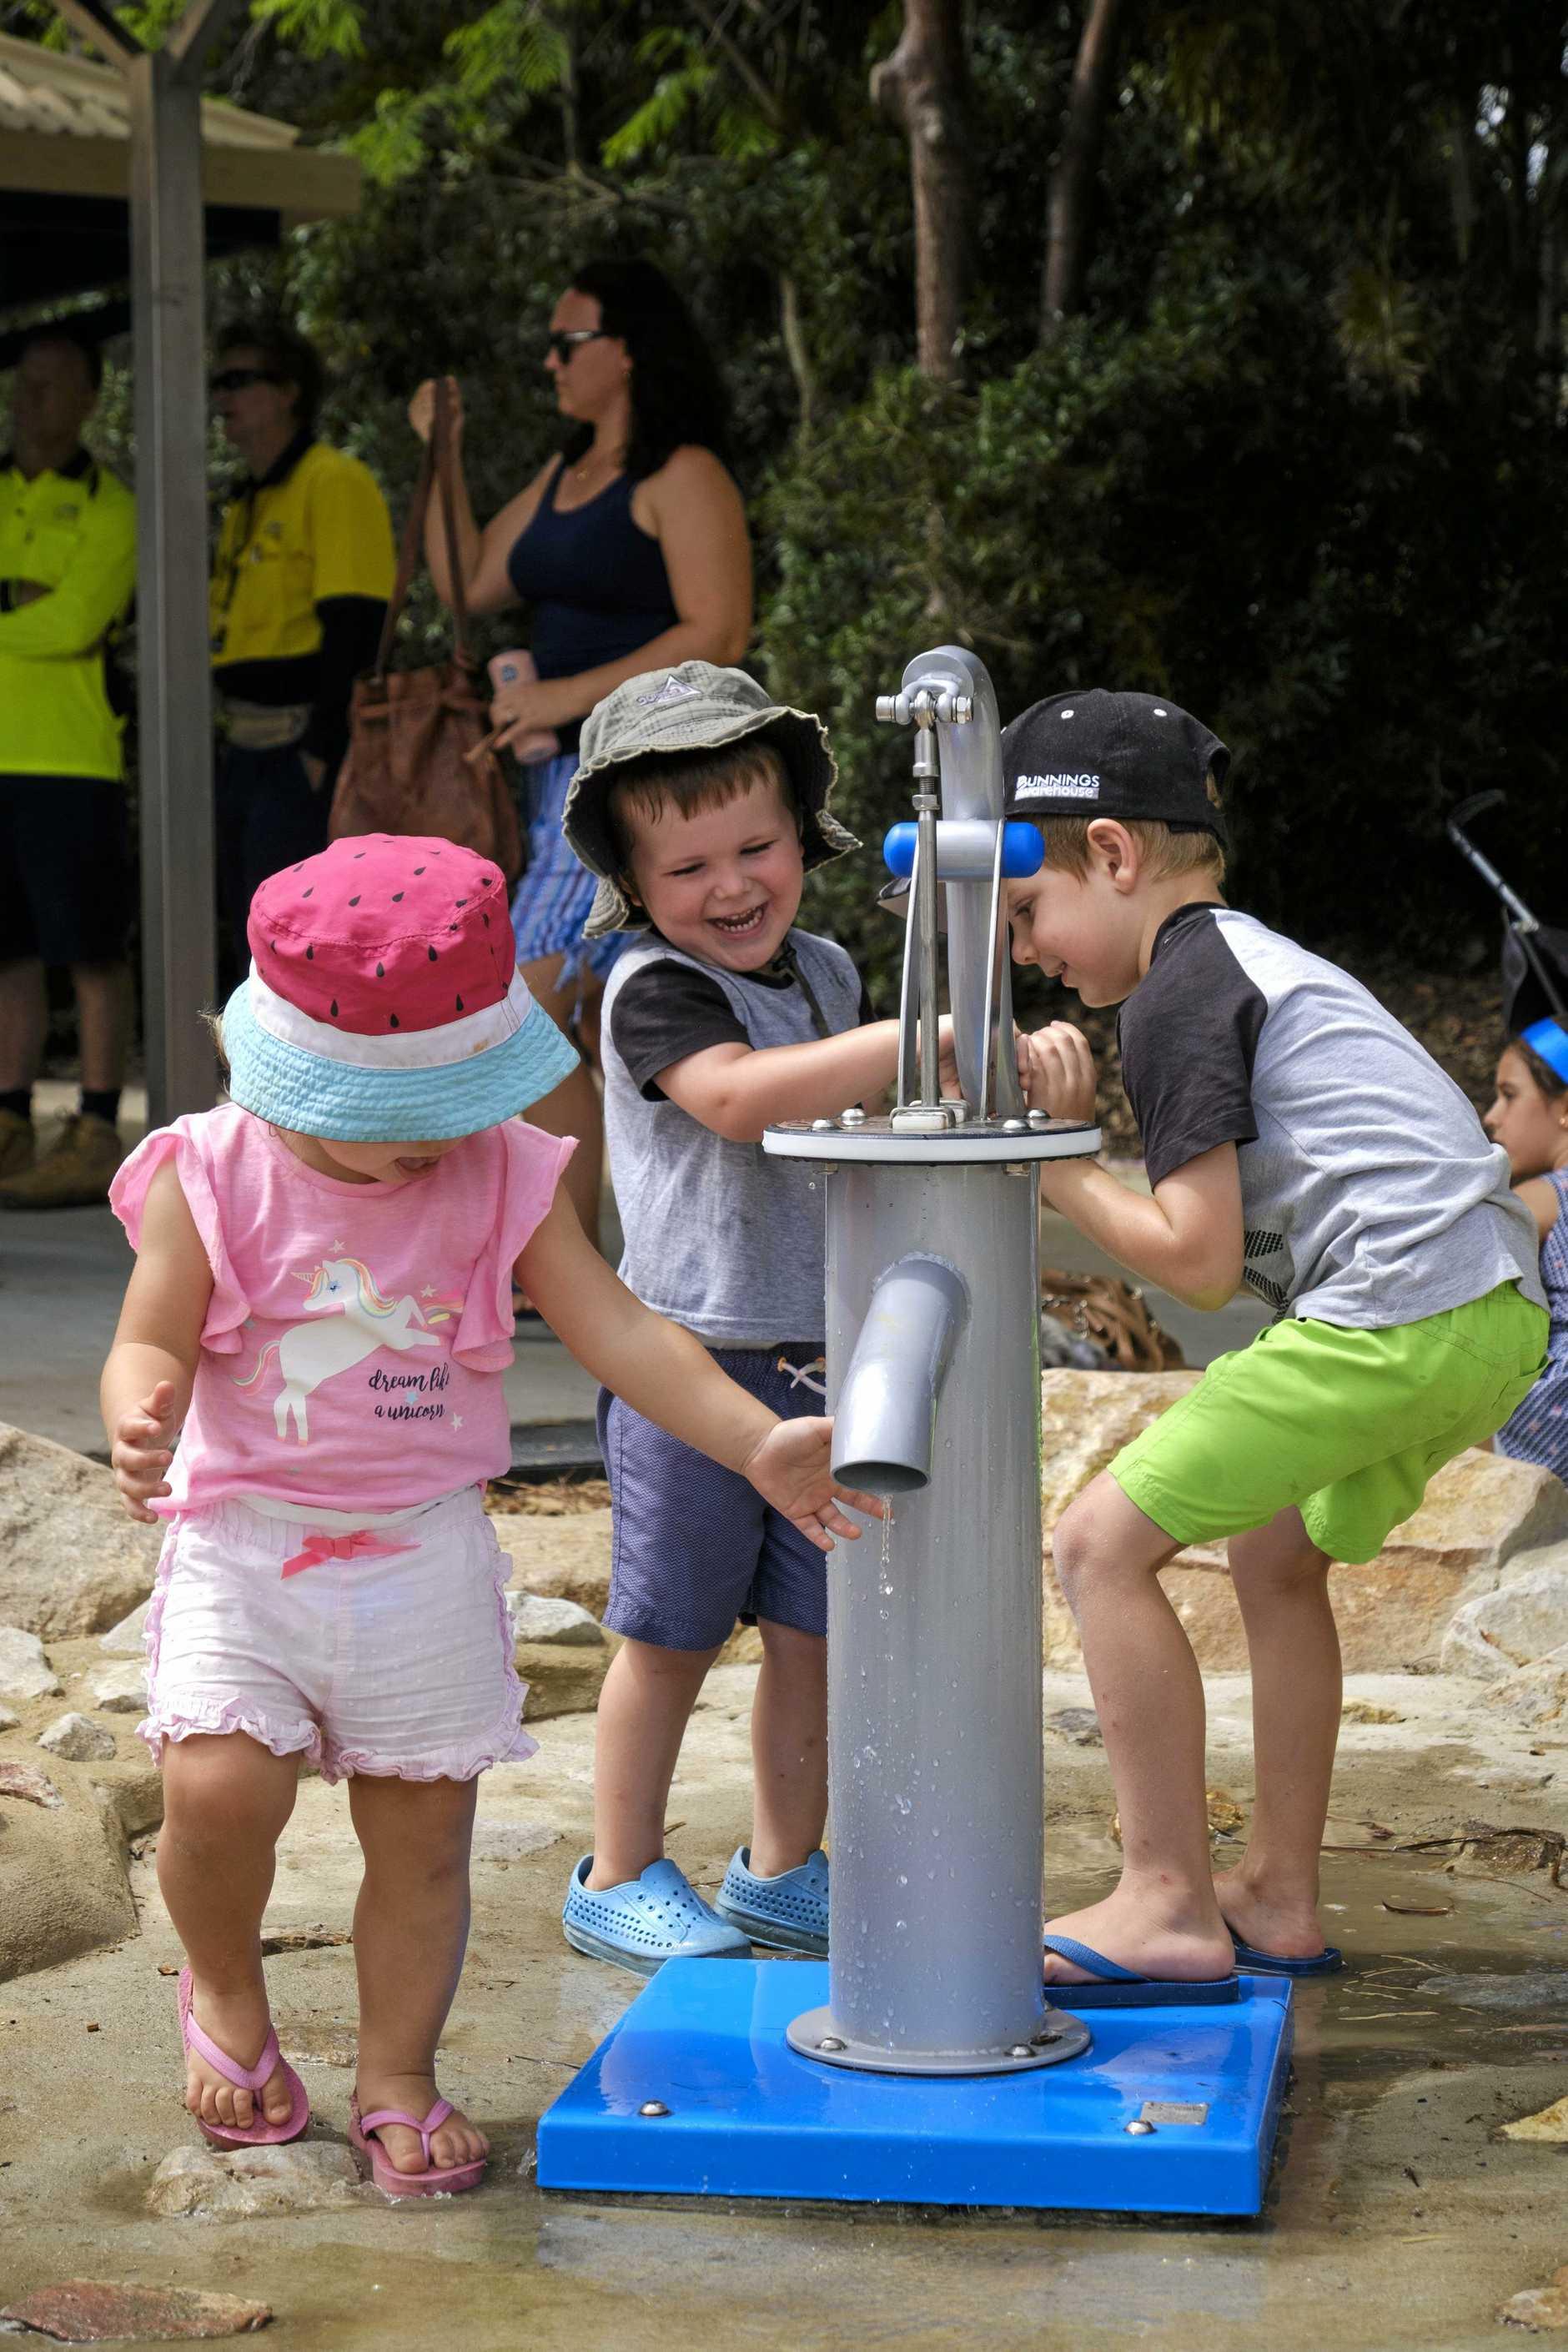 SPLASH: Addison Dick, 1, Ben Freeman, 3, and Dexter Lee, 5, play with the water pump at the new Botanic Gardens playground in North Bundaberg.